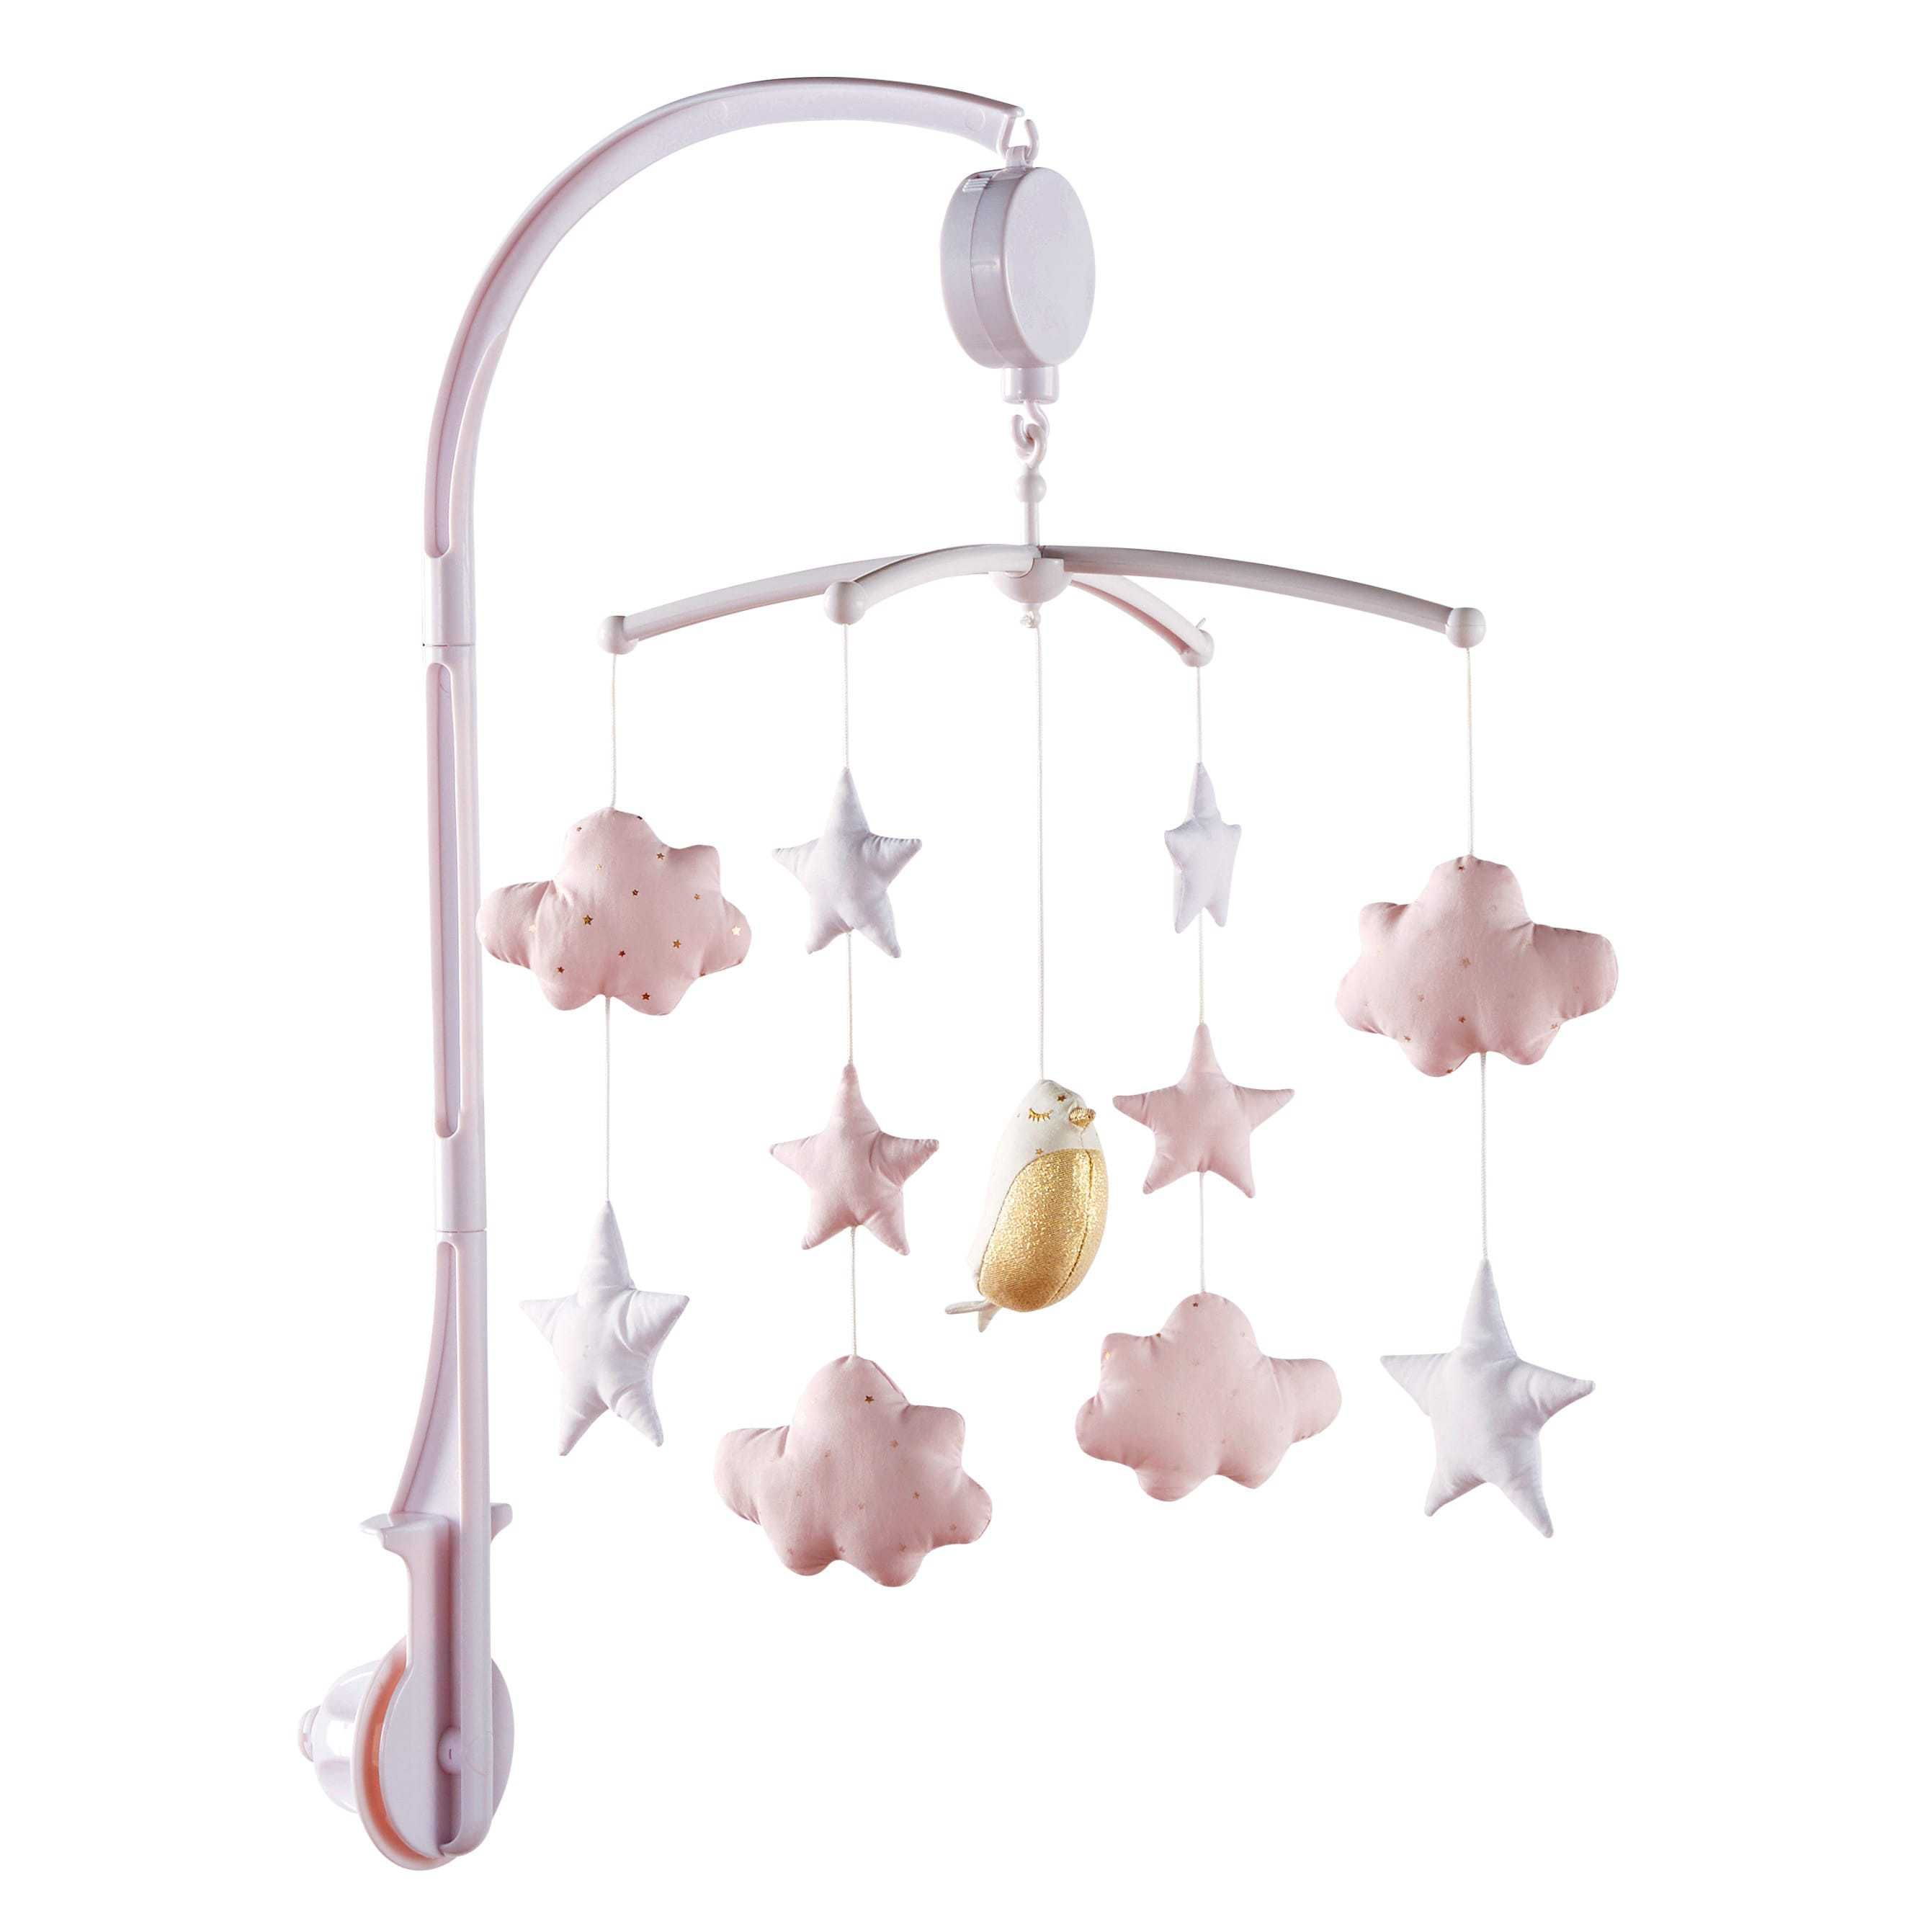 ba49a6b96 Móvil musical para bebé blanco y rosa BIRD SONG